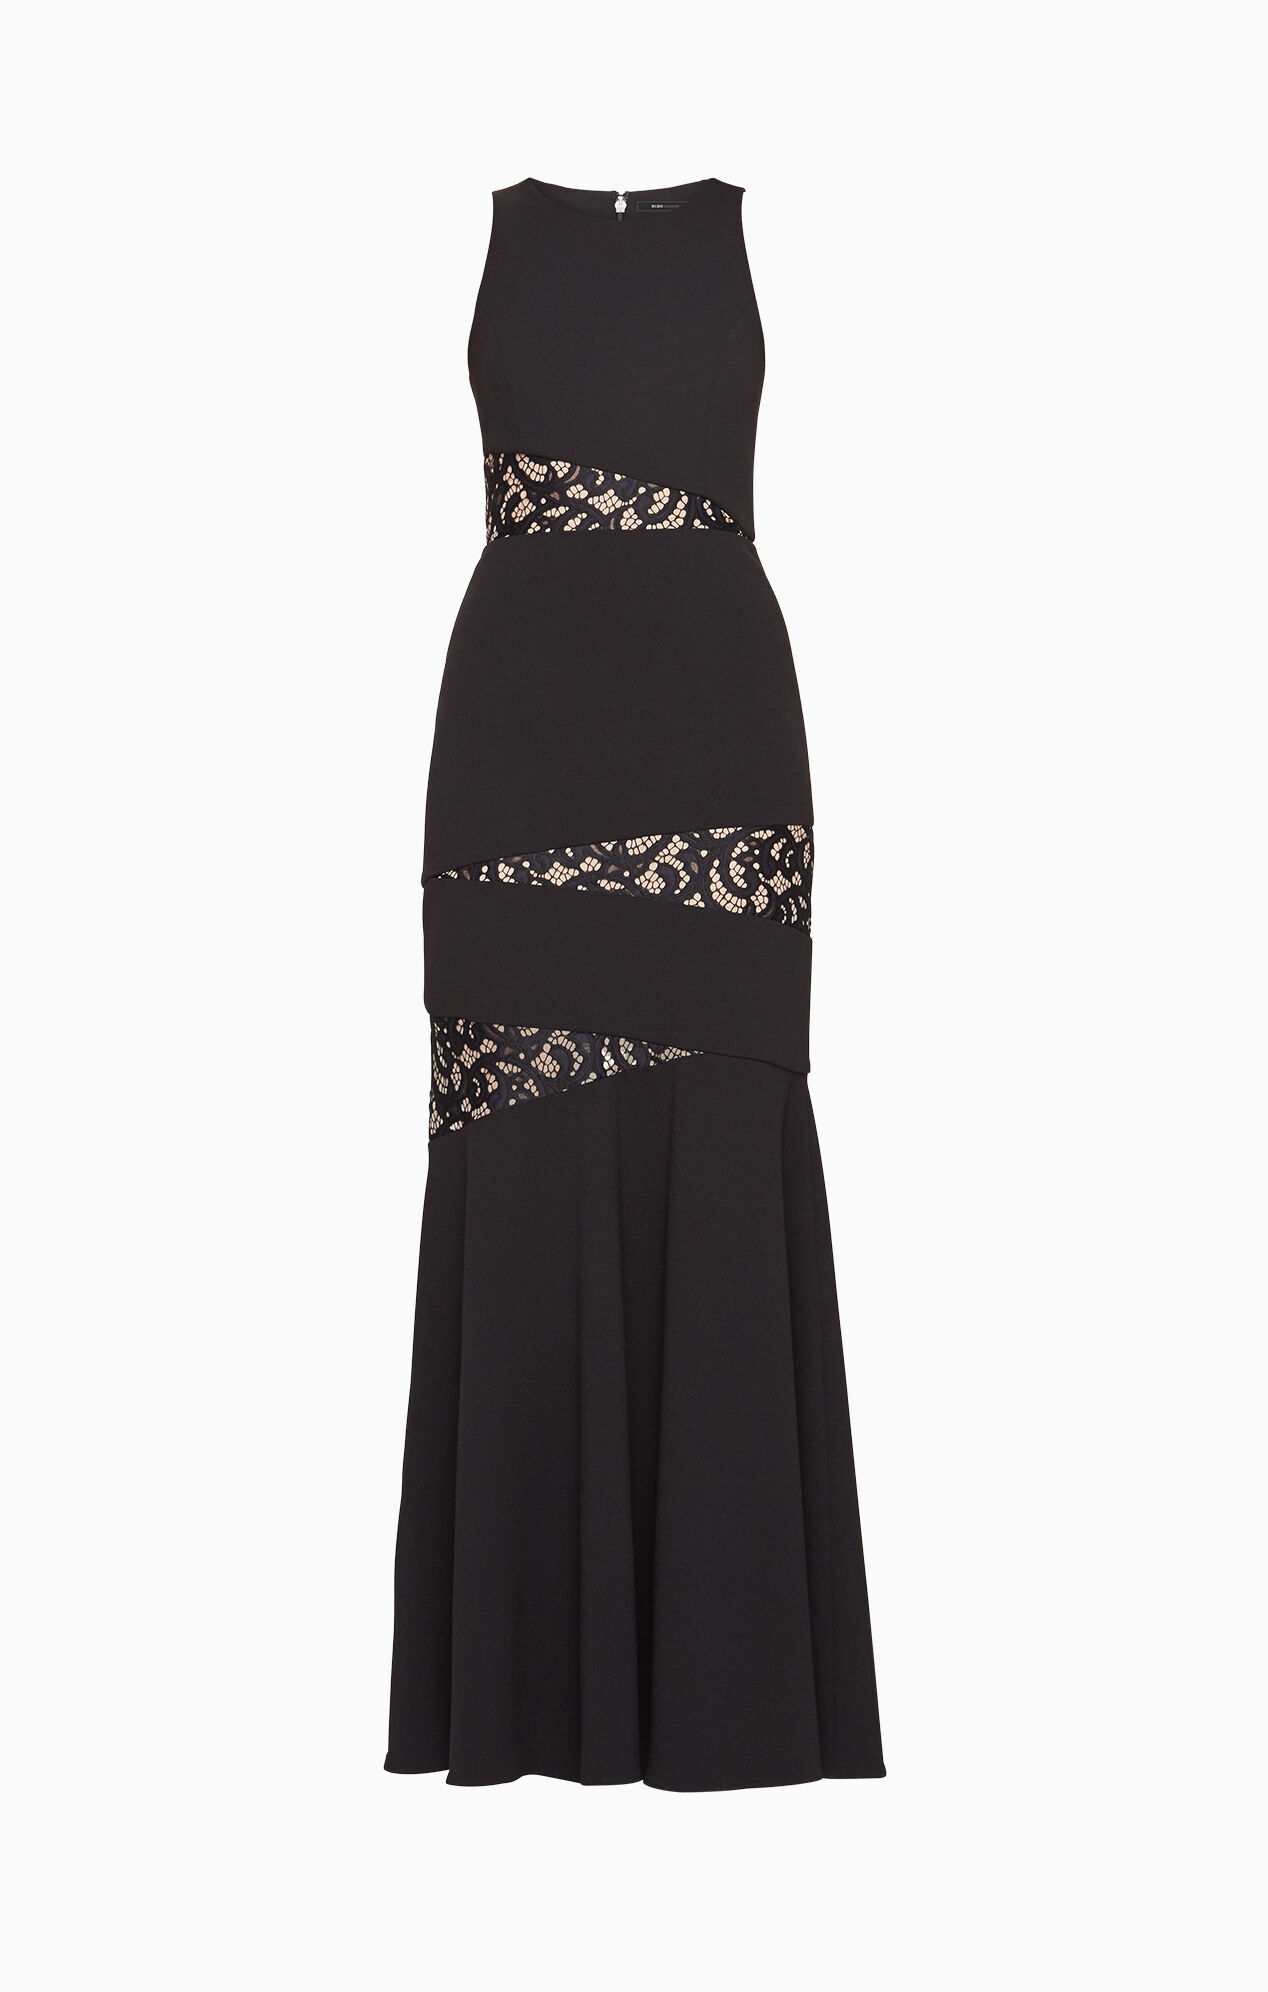 Dominique Lace-Paneled Gown